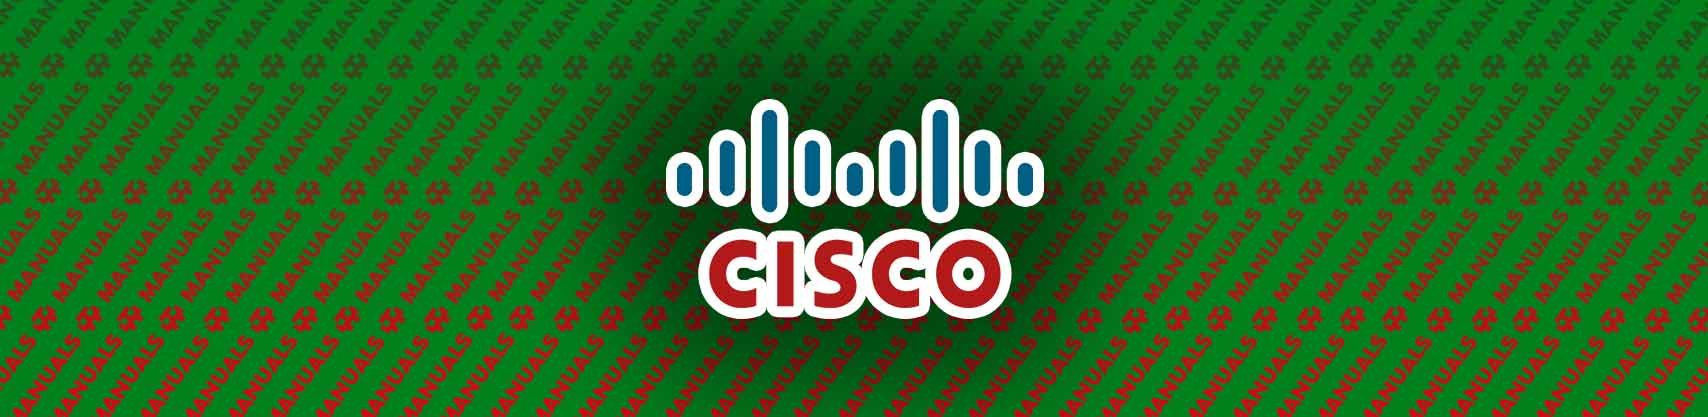 Cisco DPH-154 Manual